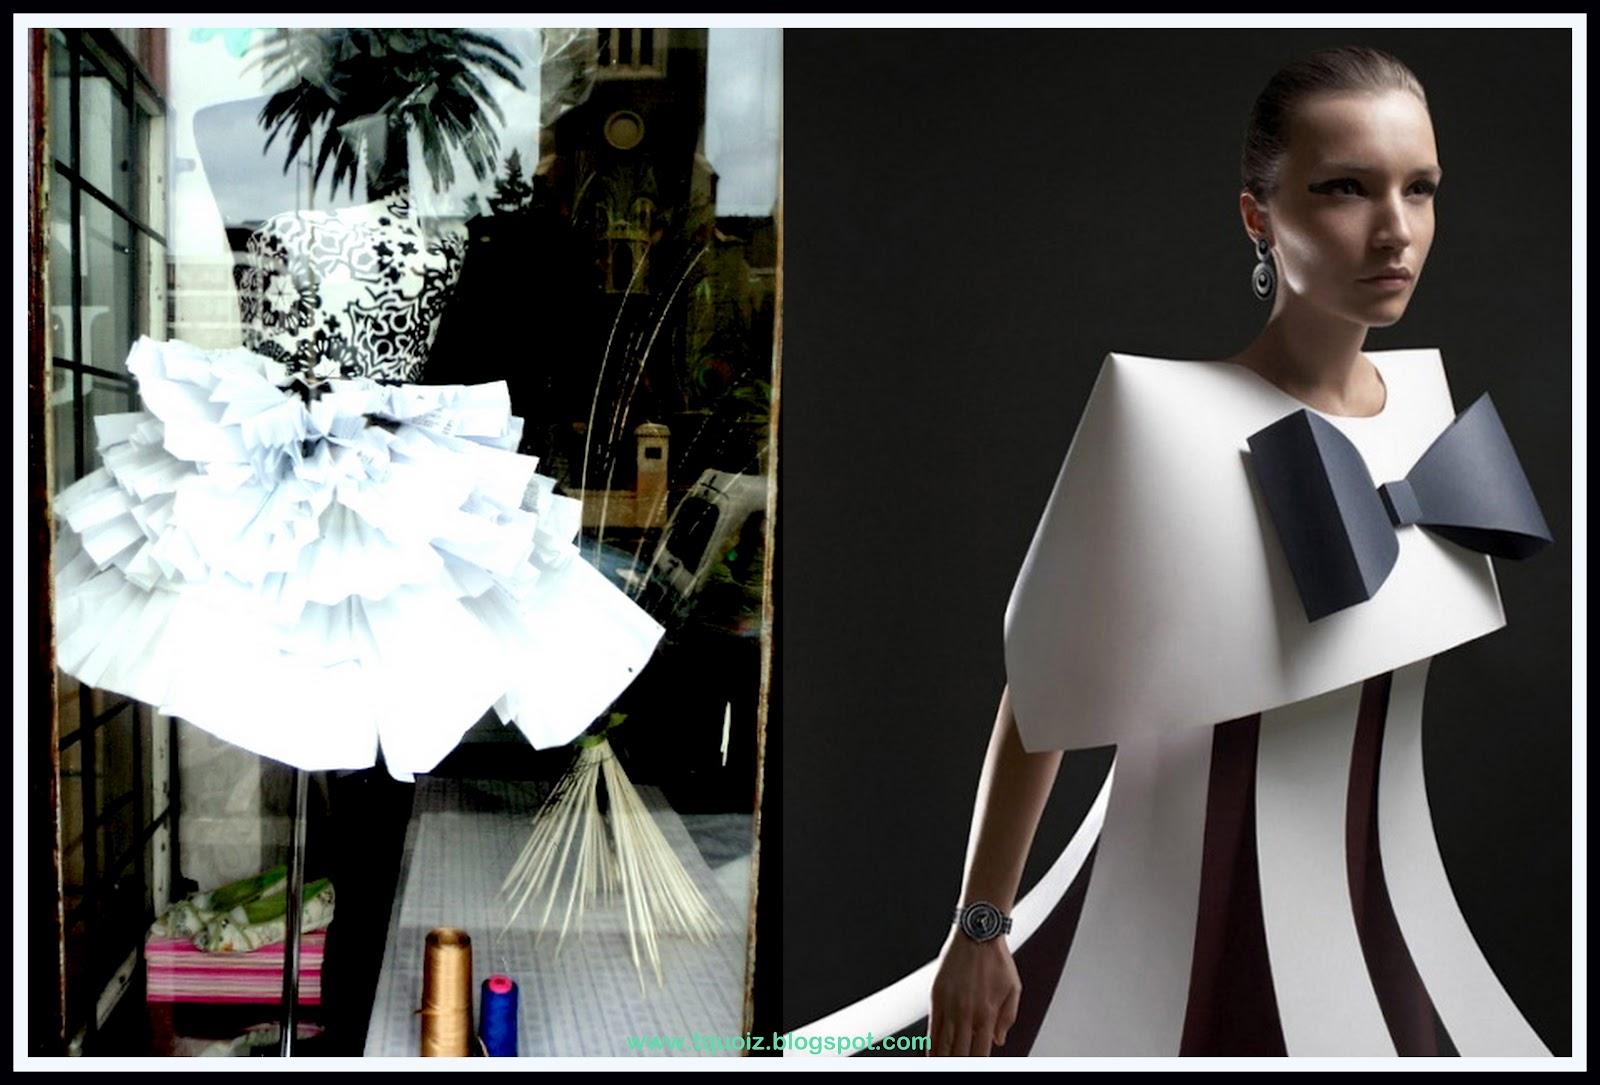 Tquoiz: Fashion Advice: Durban July 2012